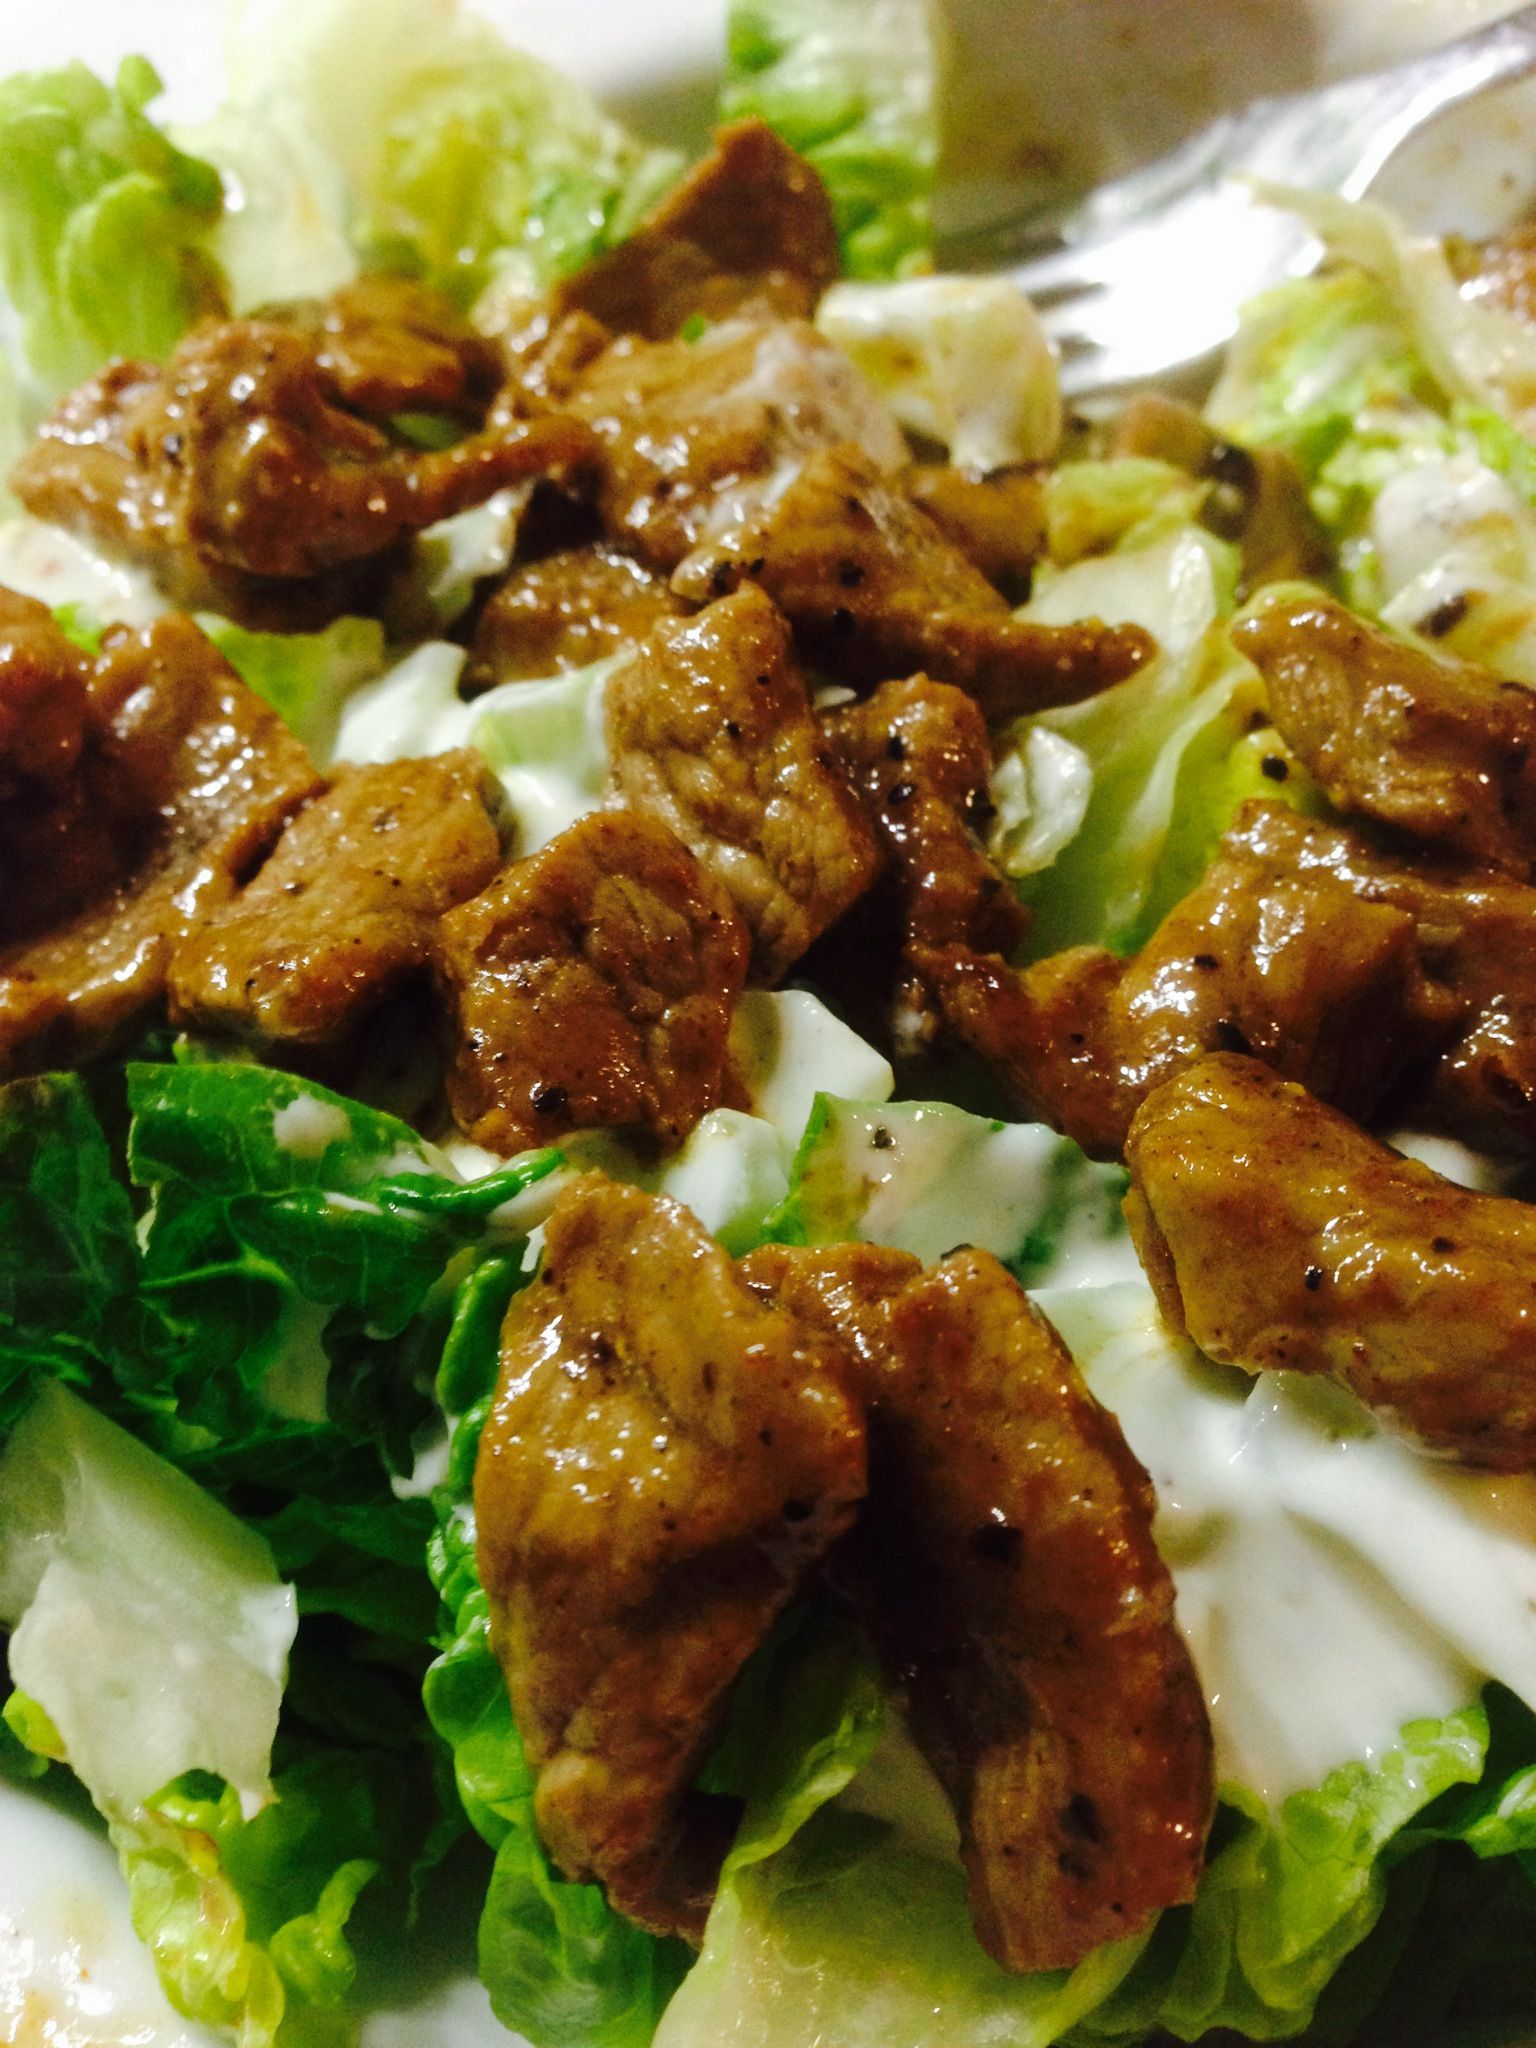 rindfleisch in baharat marinade auf salat rezept low carb rezepte pinterest rindfleisch. Black Bedroom Furniture Sets. Home Design Ideas